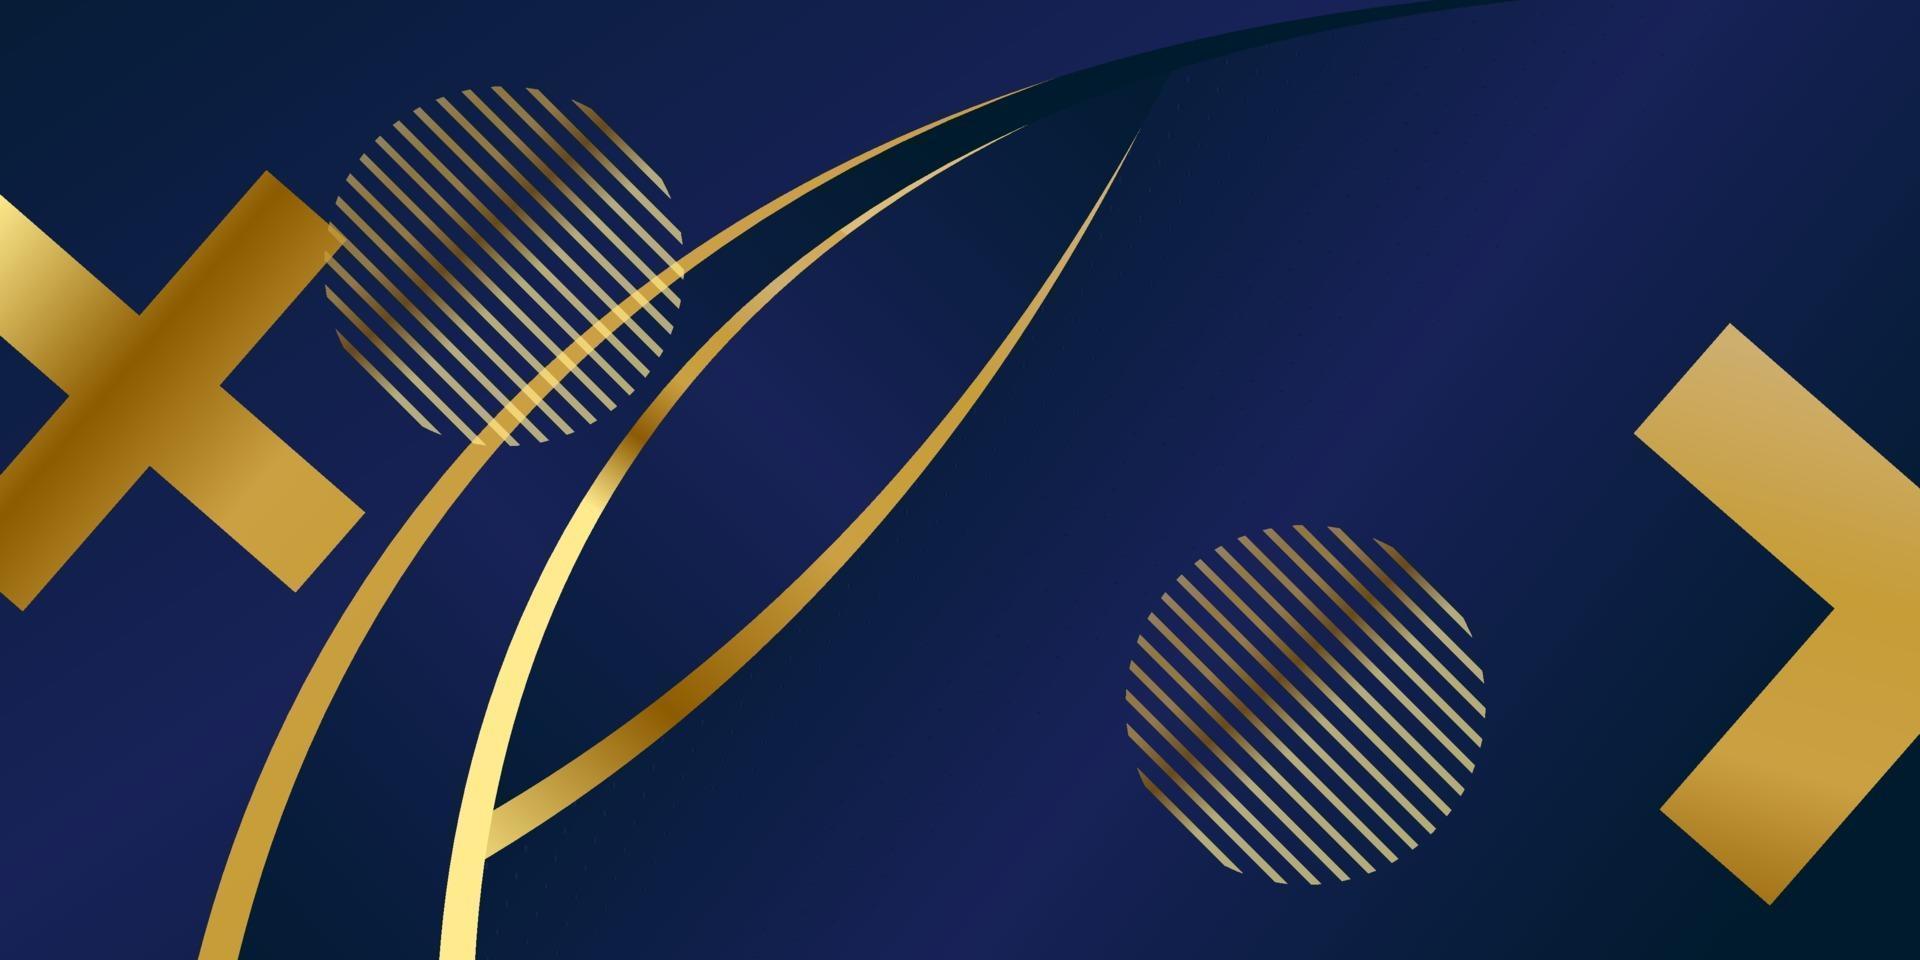 abstraktes polygonales Muster Luxus dunkelblau mit Gold vektor